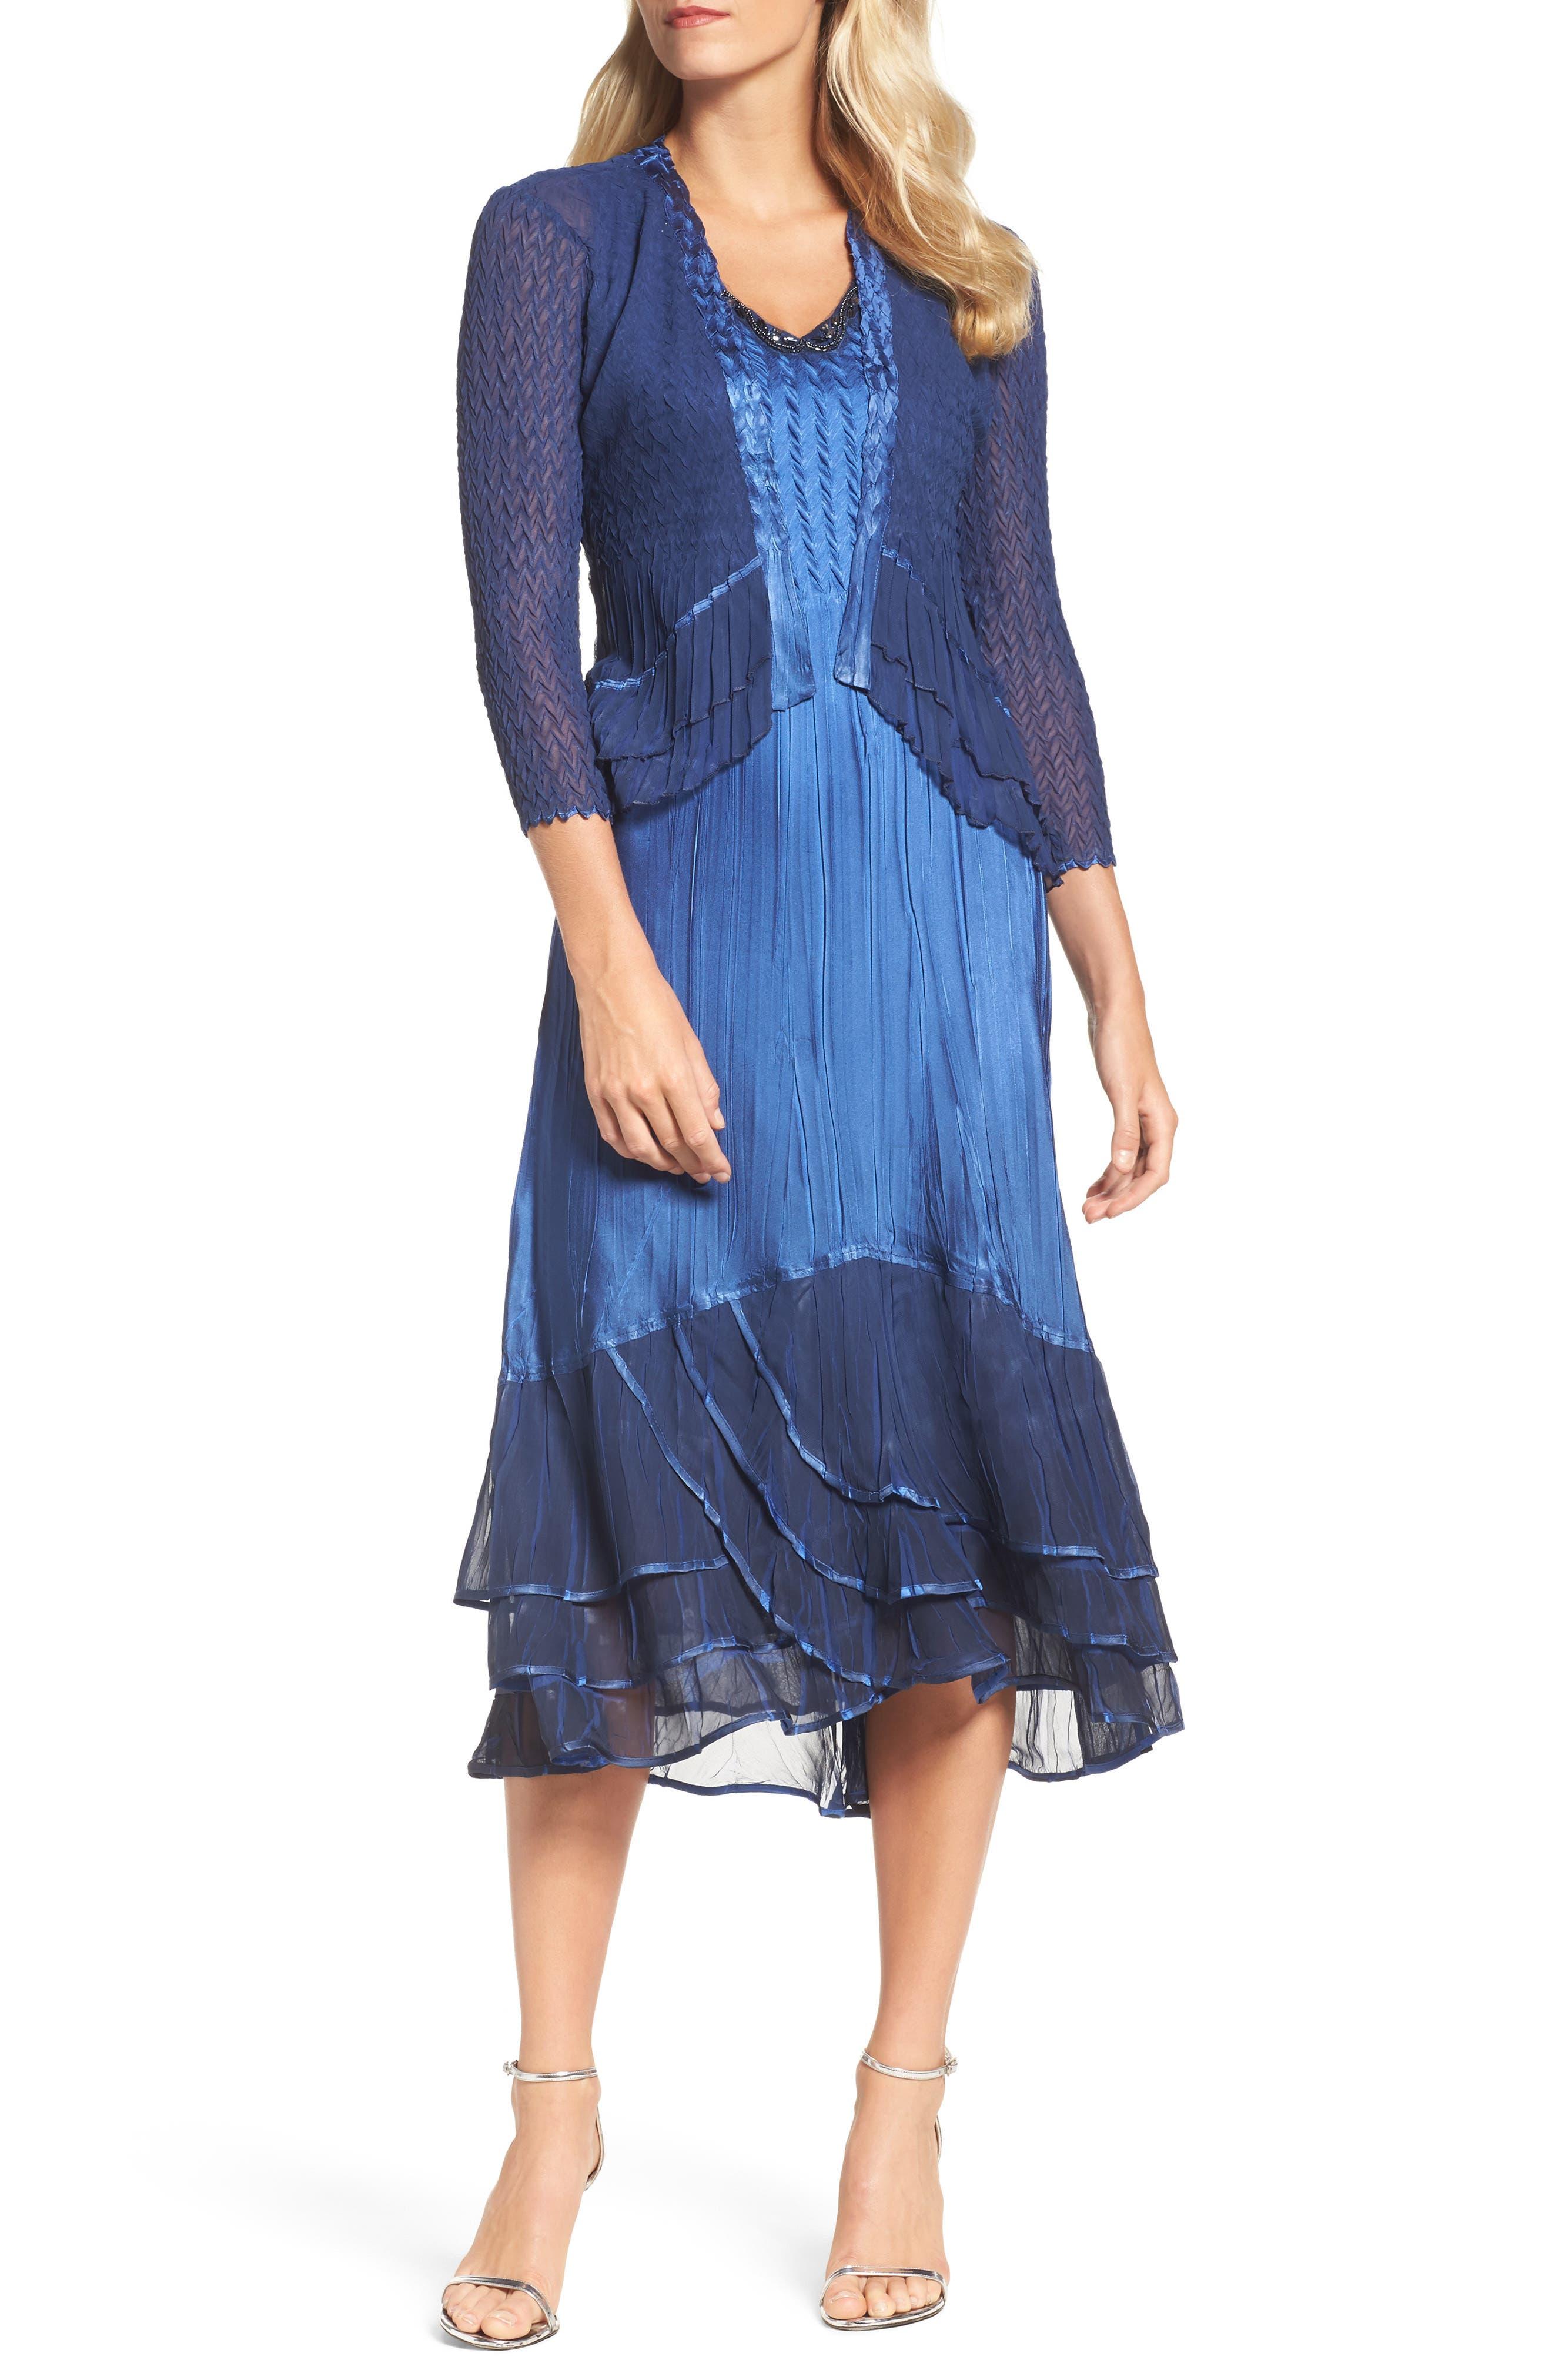 Komarov Embellished Tiered Hem Dress with Jacket (Regular & Petite)